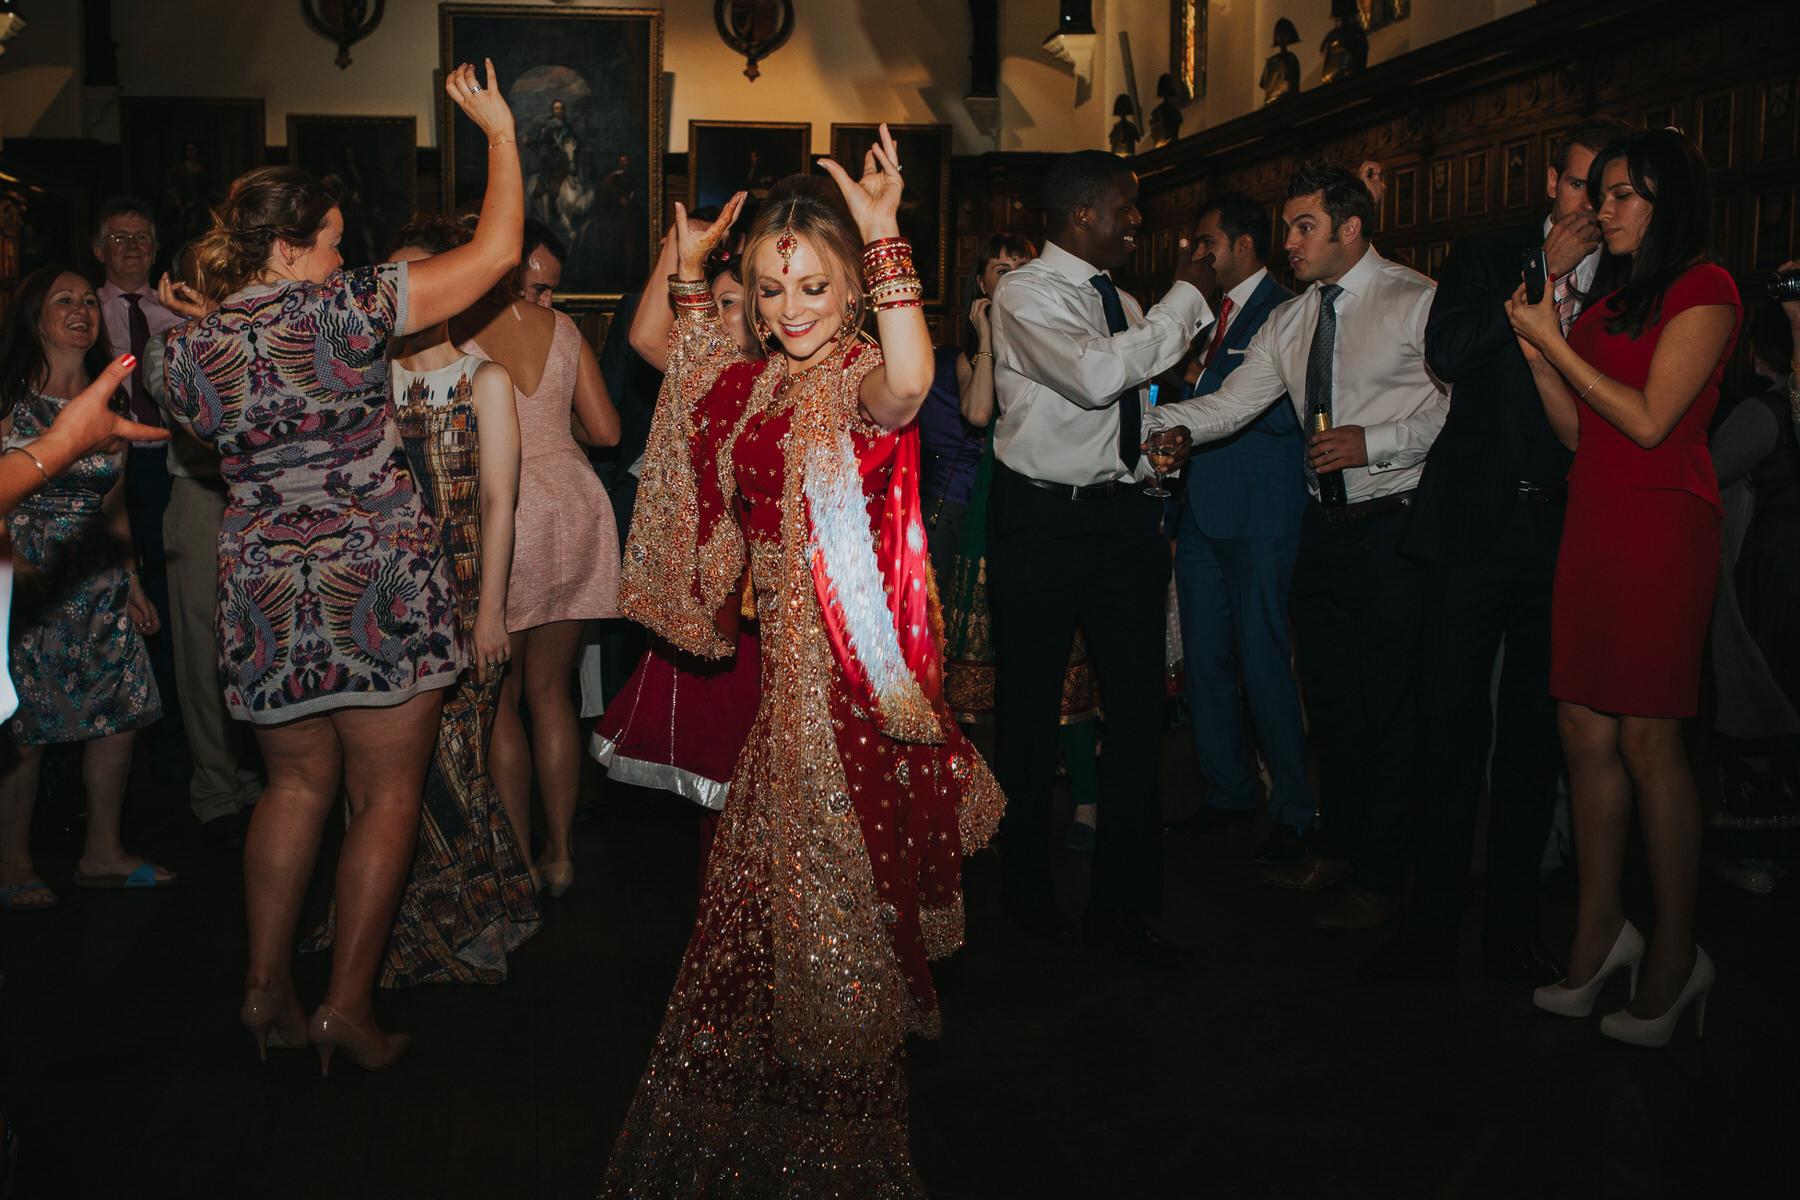 232-Anglo-Asian-wedding-bride-dancing-red-sari.jpg